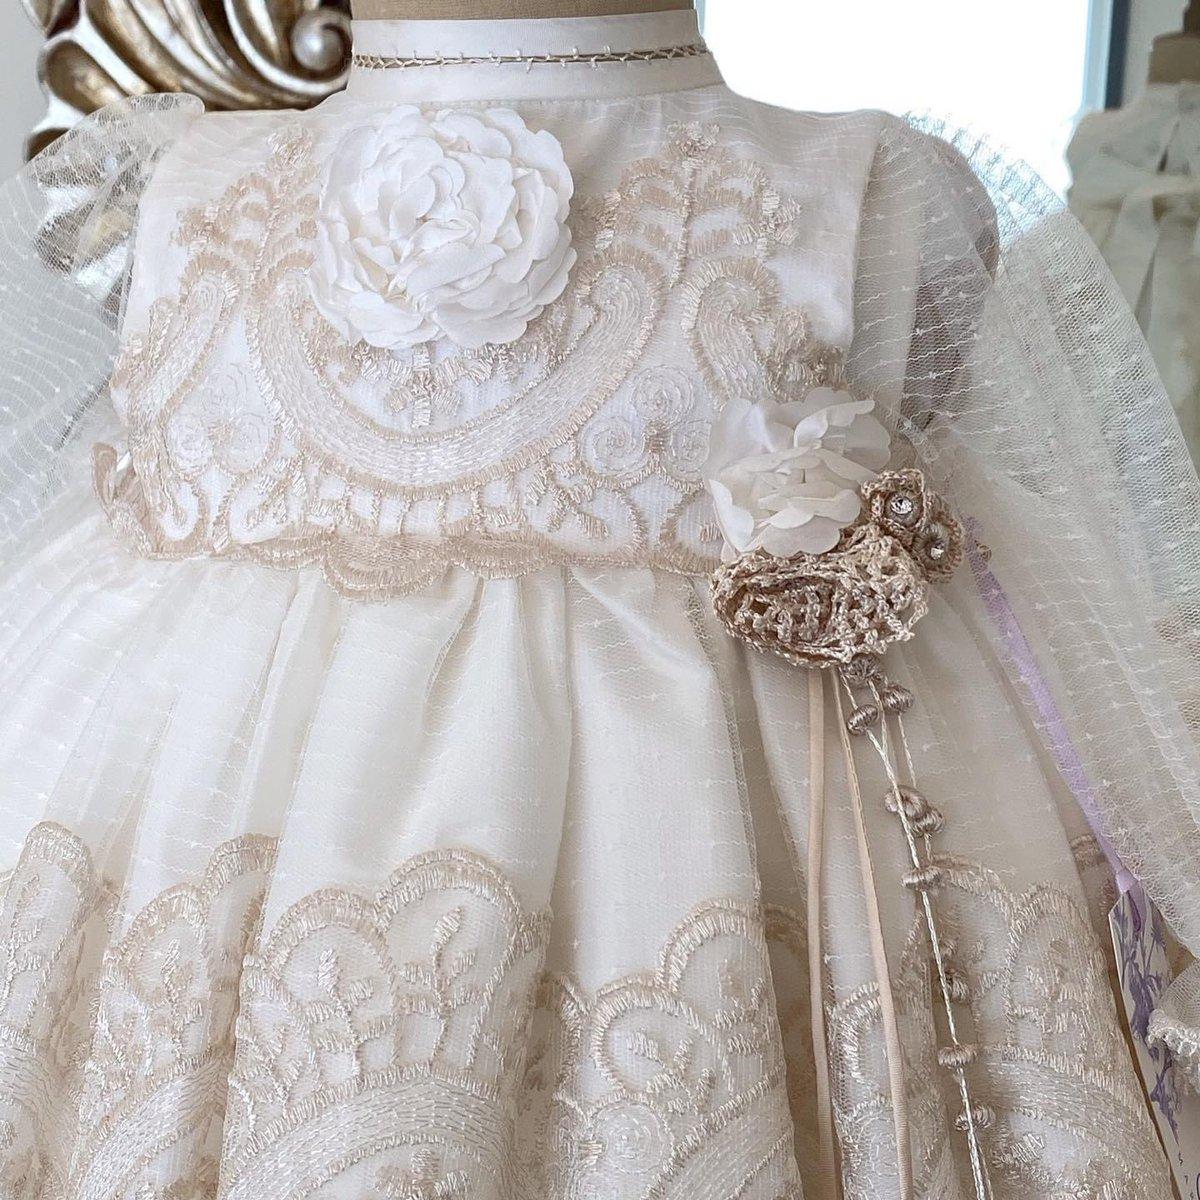 Dulzura y Elegancia 🤍 . . . #MariaEdgarAtelier #luxury #babydress #baptismgown #ropon #babylove #babyoutfit #babygirl #bebemoderno #baby #madeinmexico  @ Tampico-Madero